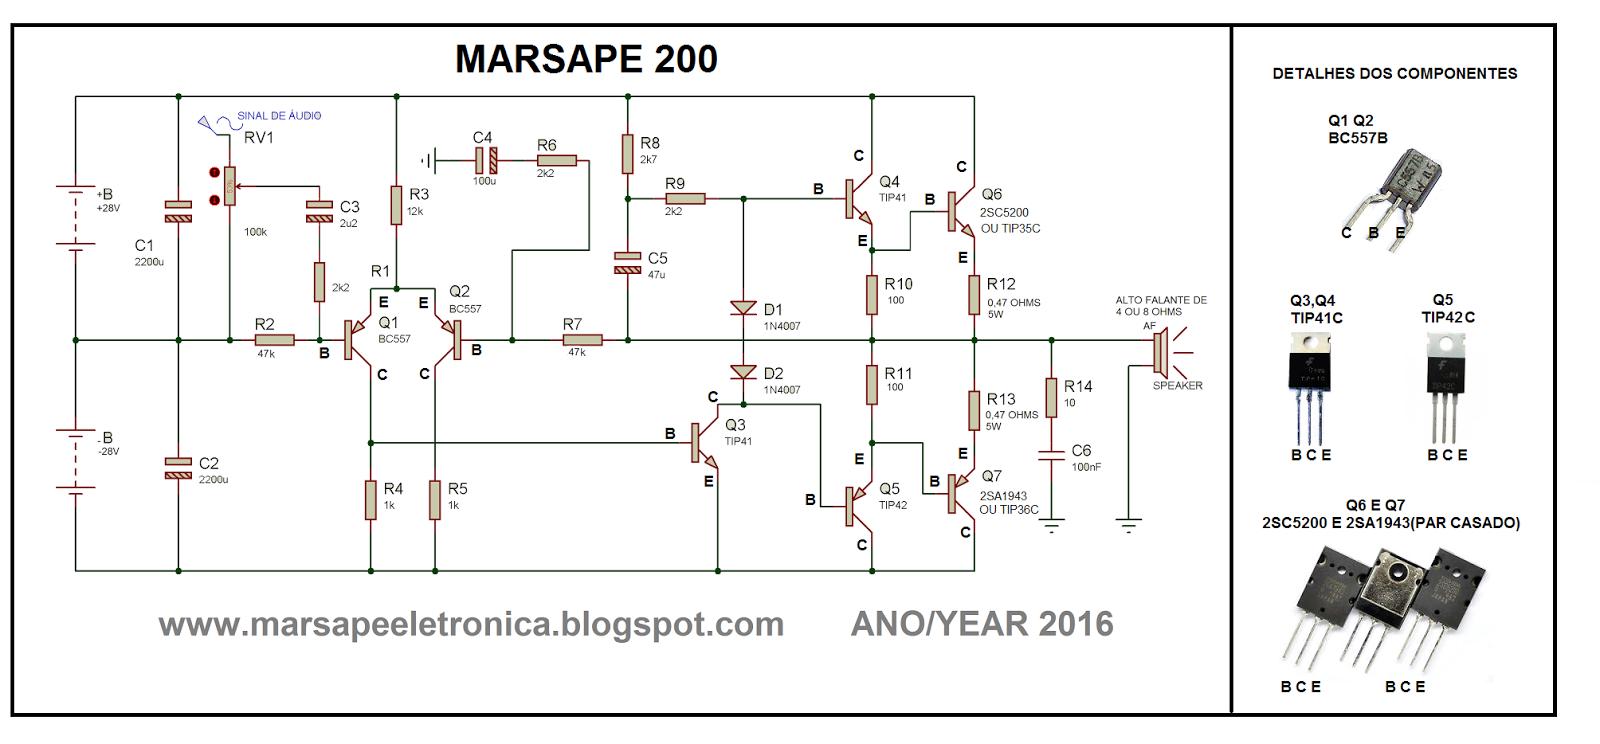 Marsape Eletrnica Amplificadores De Udio Batista Usb Power Booster Circuit Diagram Nonstopfree Electronic Circuits Audio Projects To Try